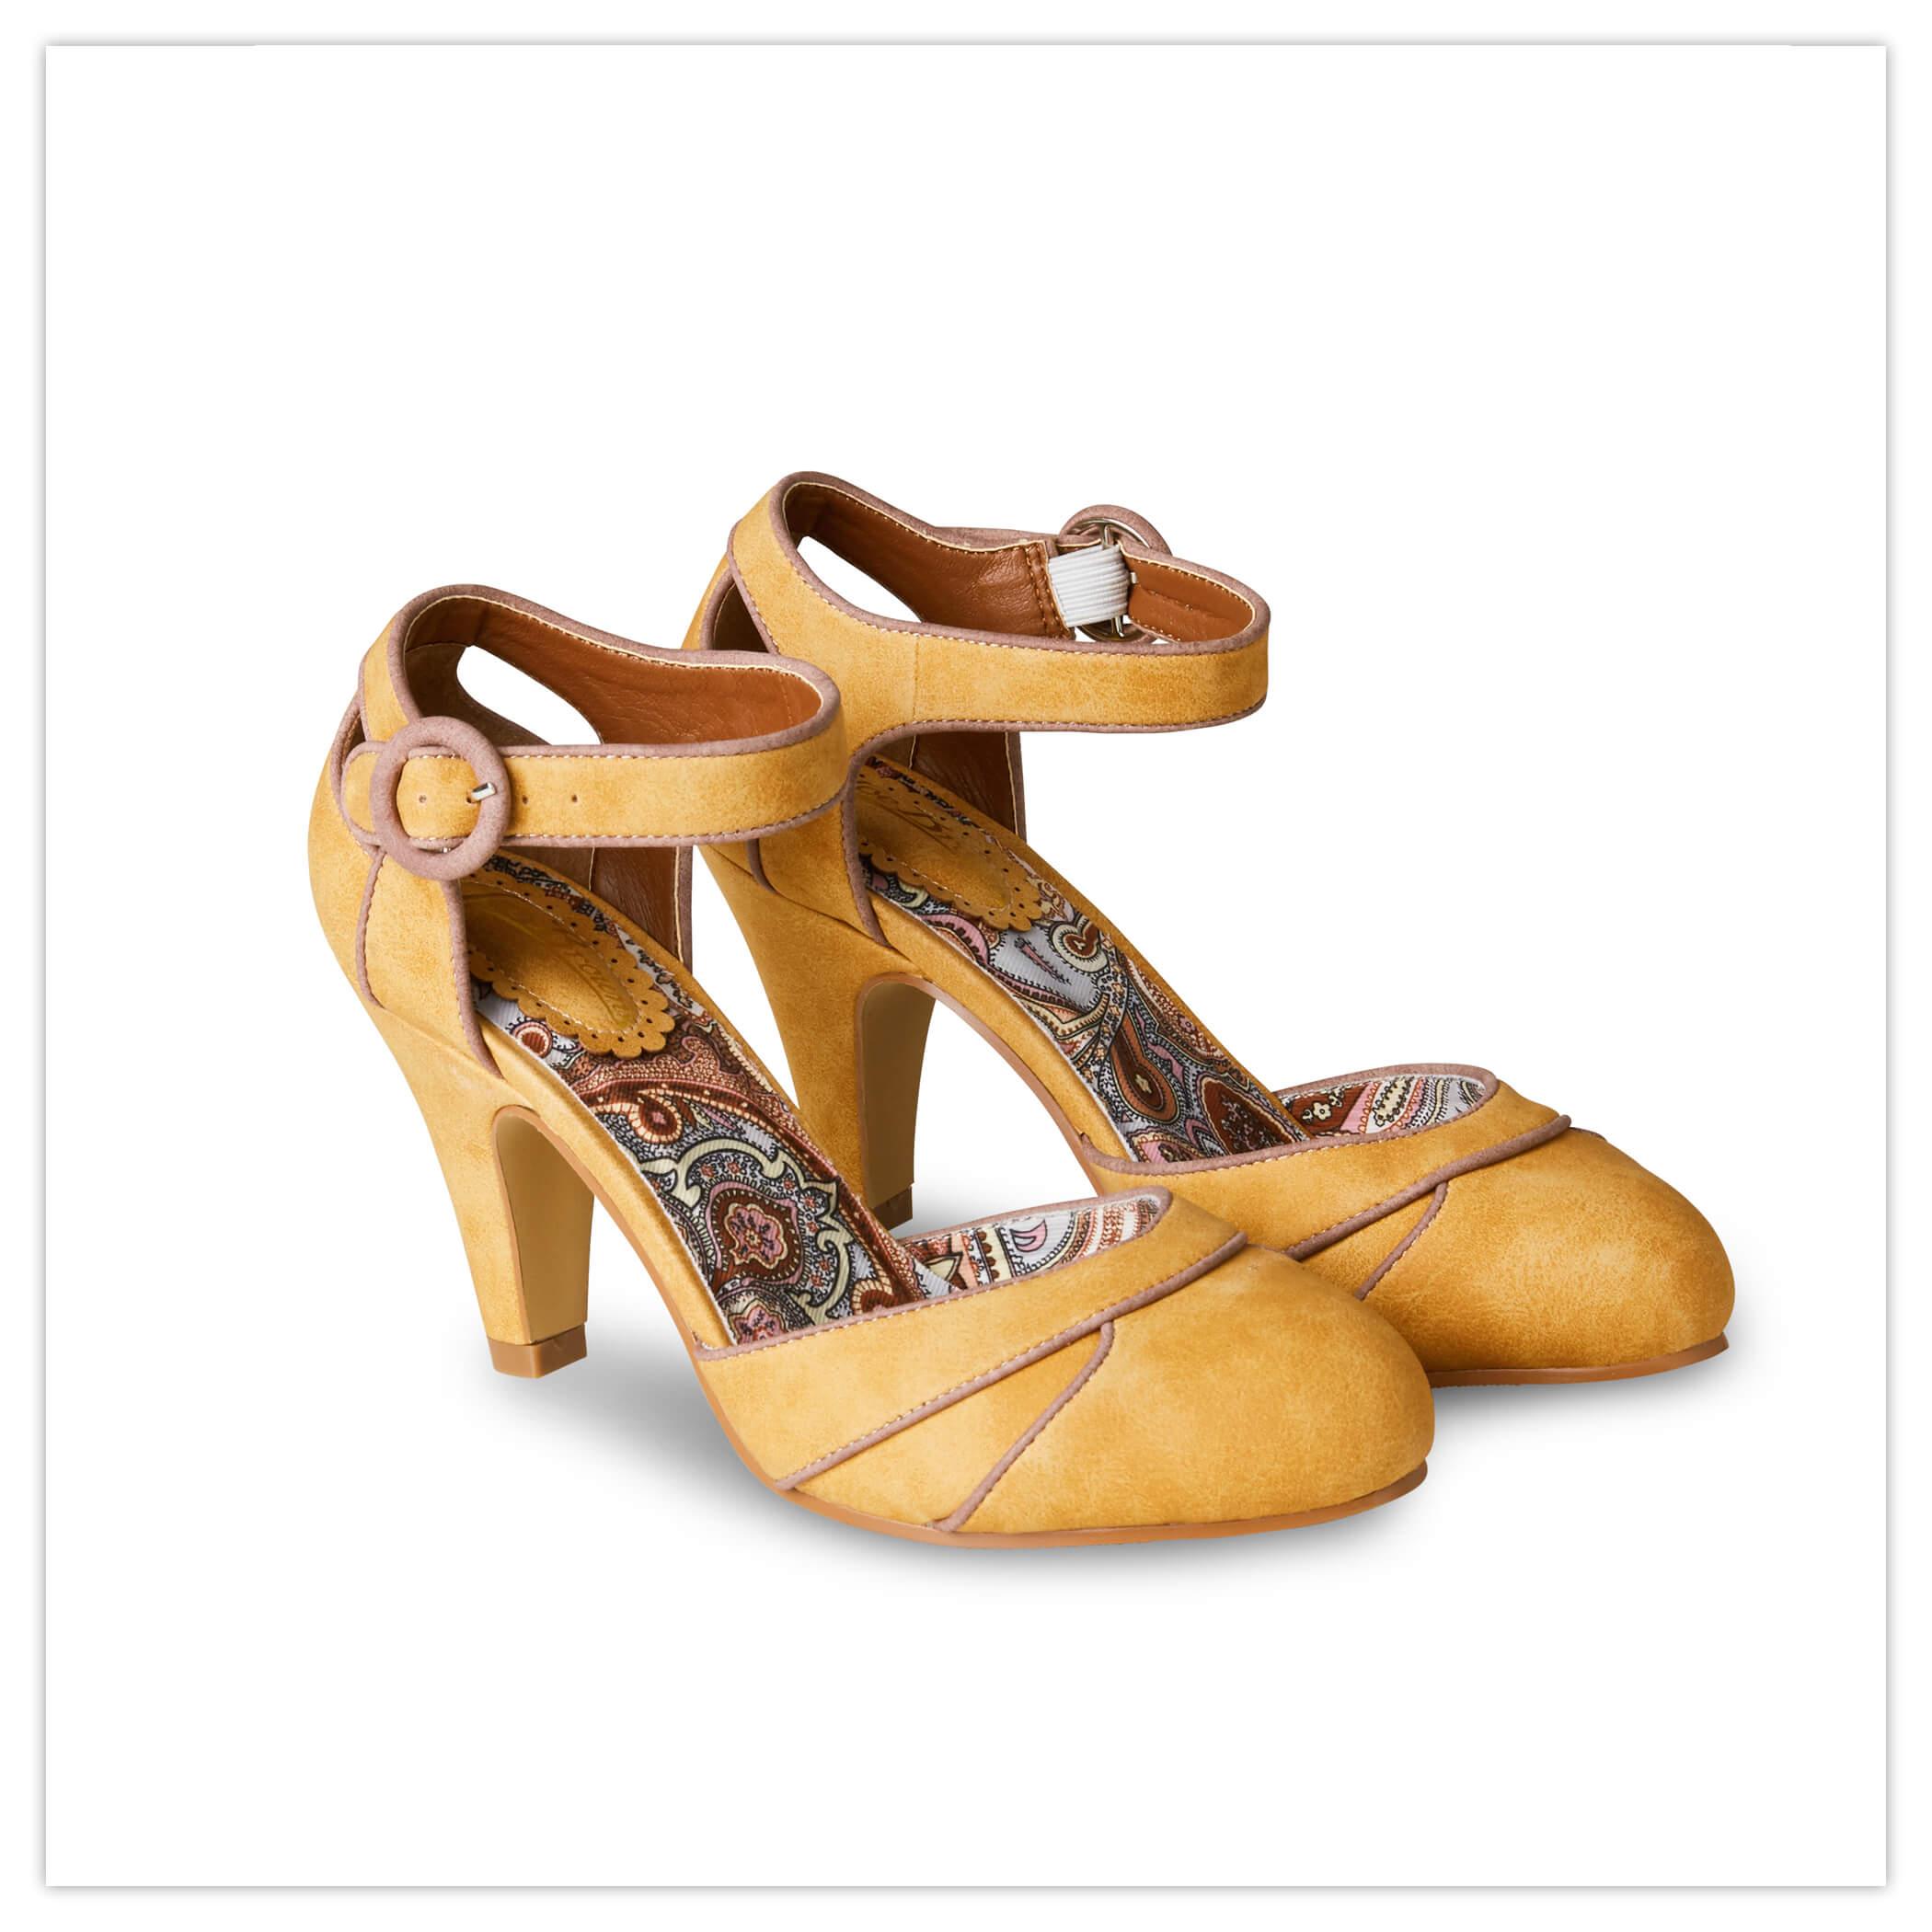 Joe Browns Twilight Cafe Shoes